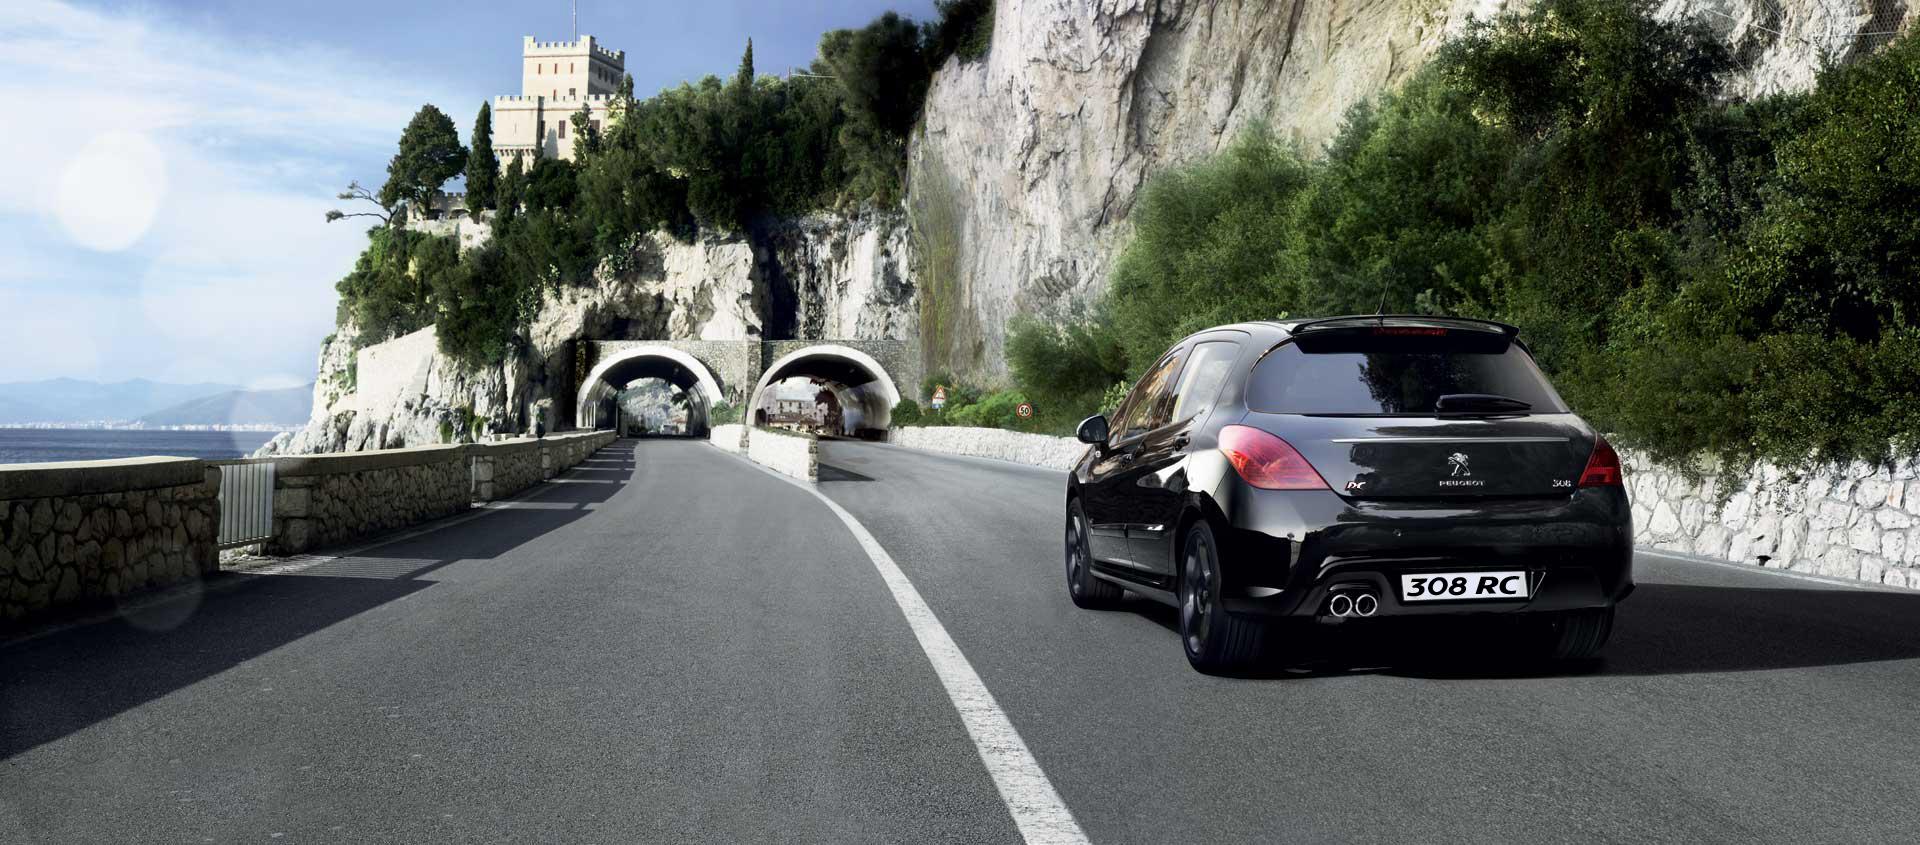 Nuevo Peugeot 308 RC 2012 ya en México